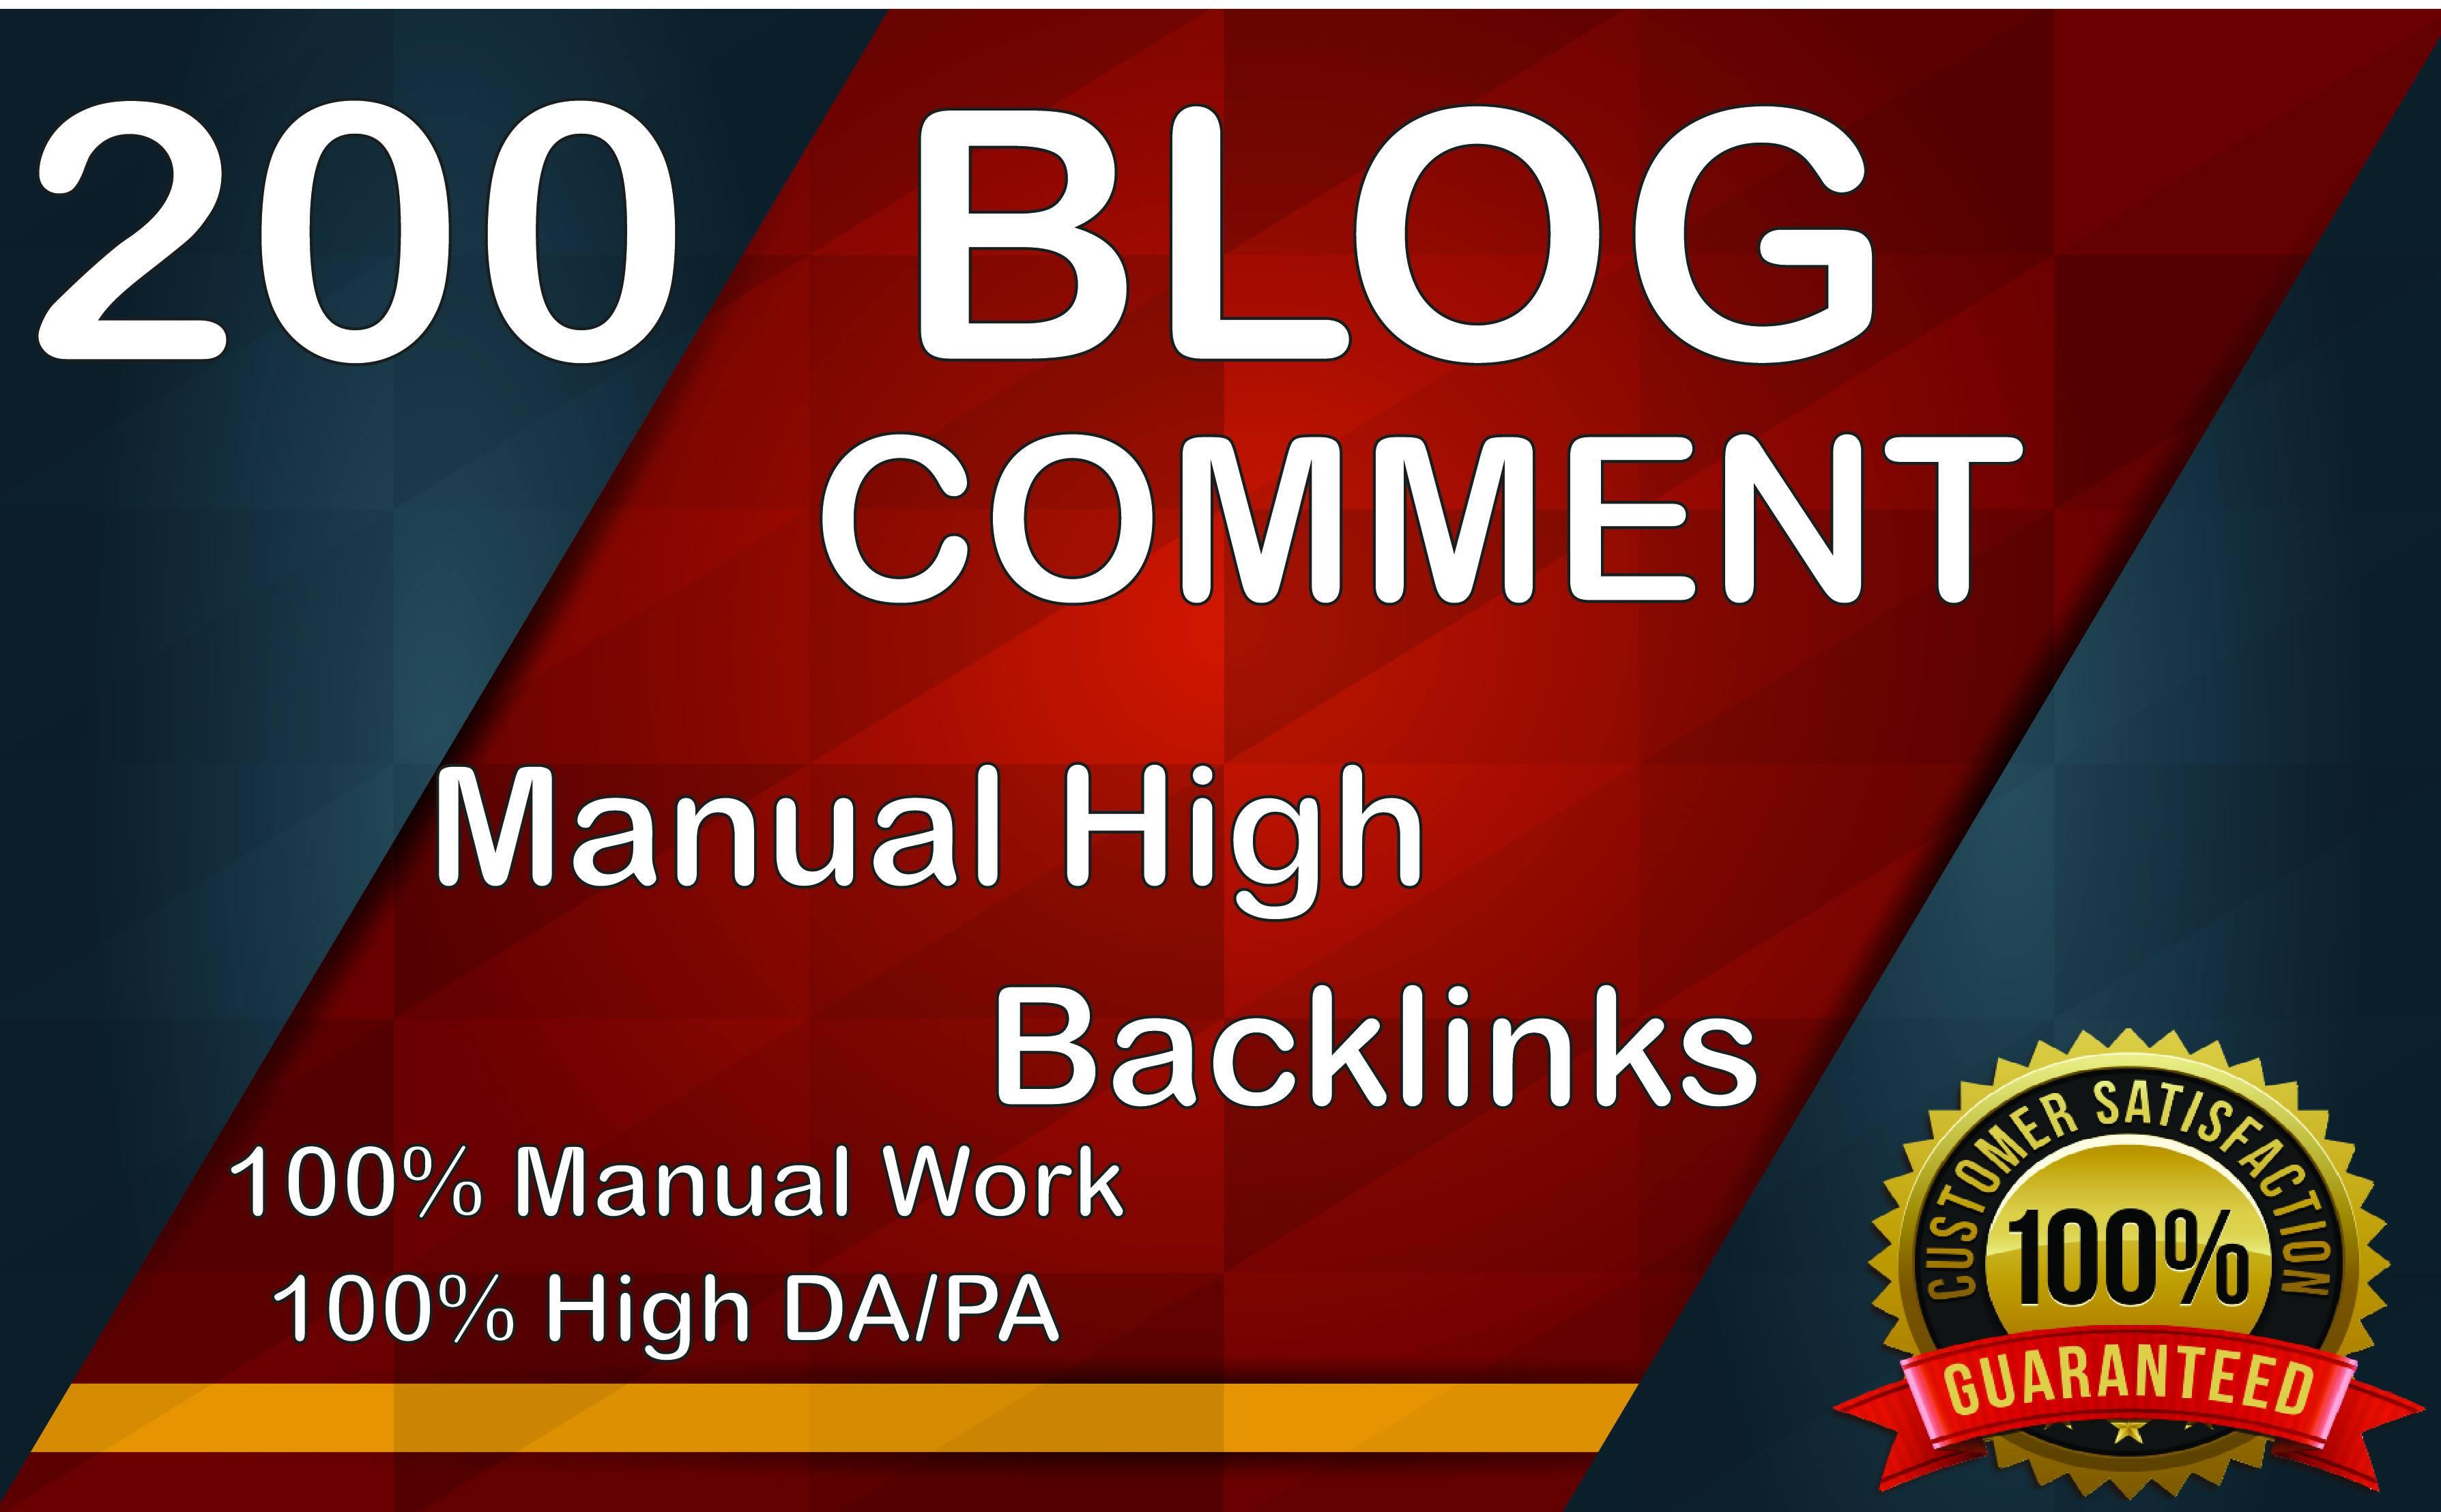 I will do 200 blogcomment dofollow backlink